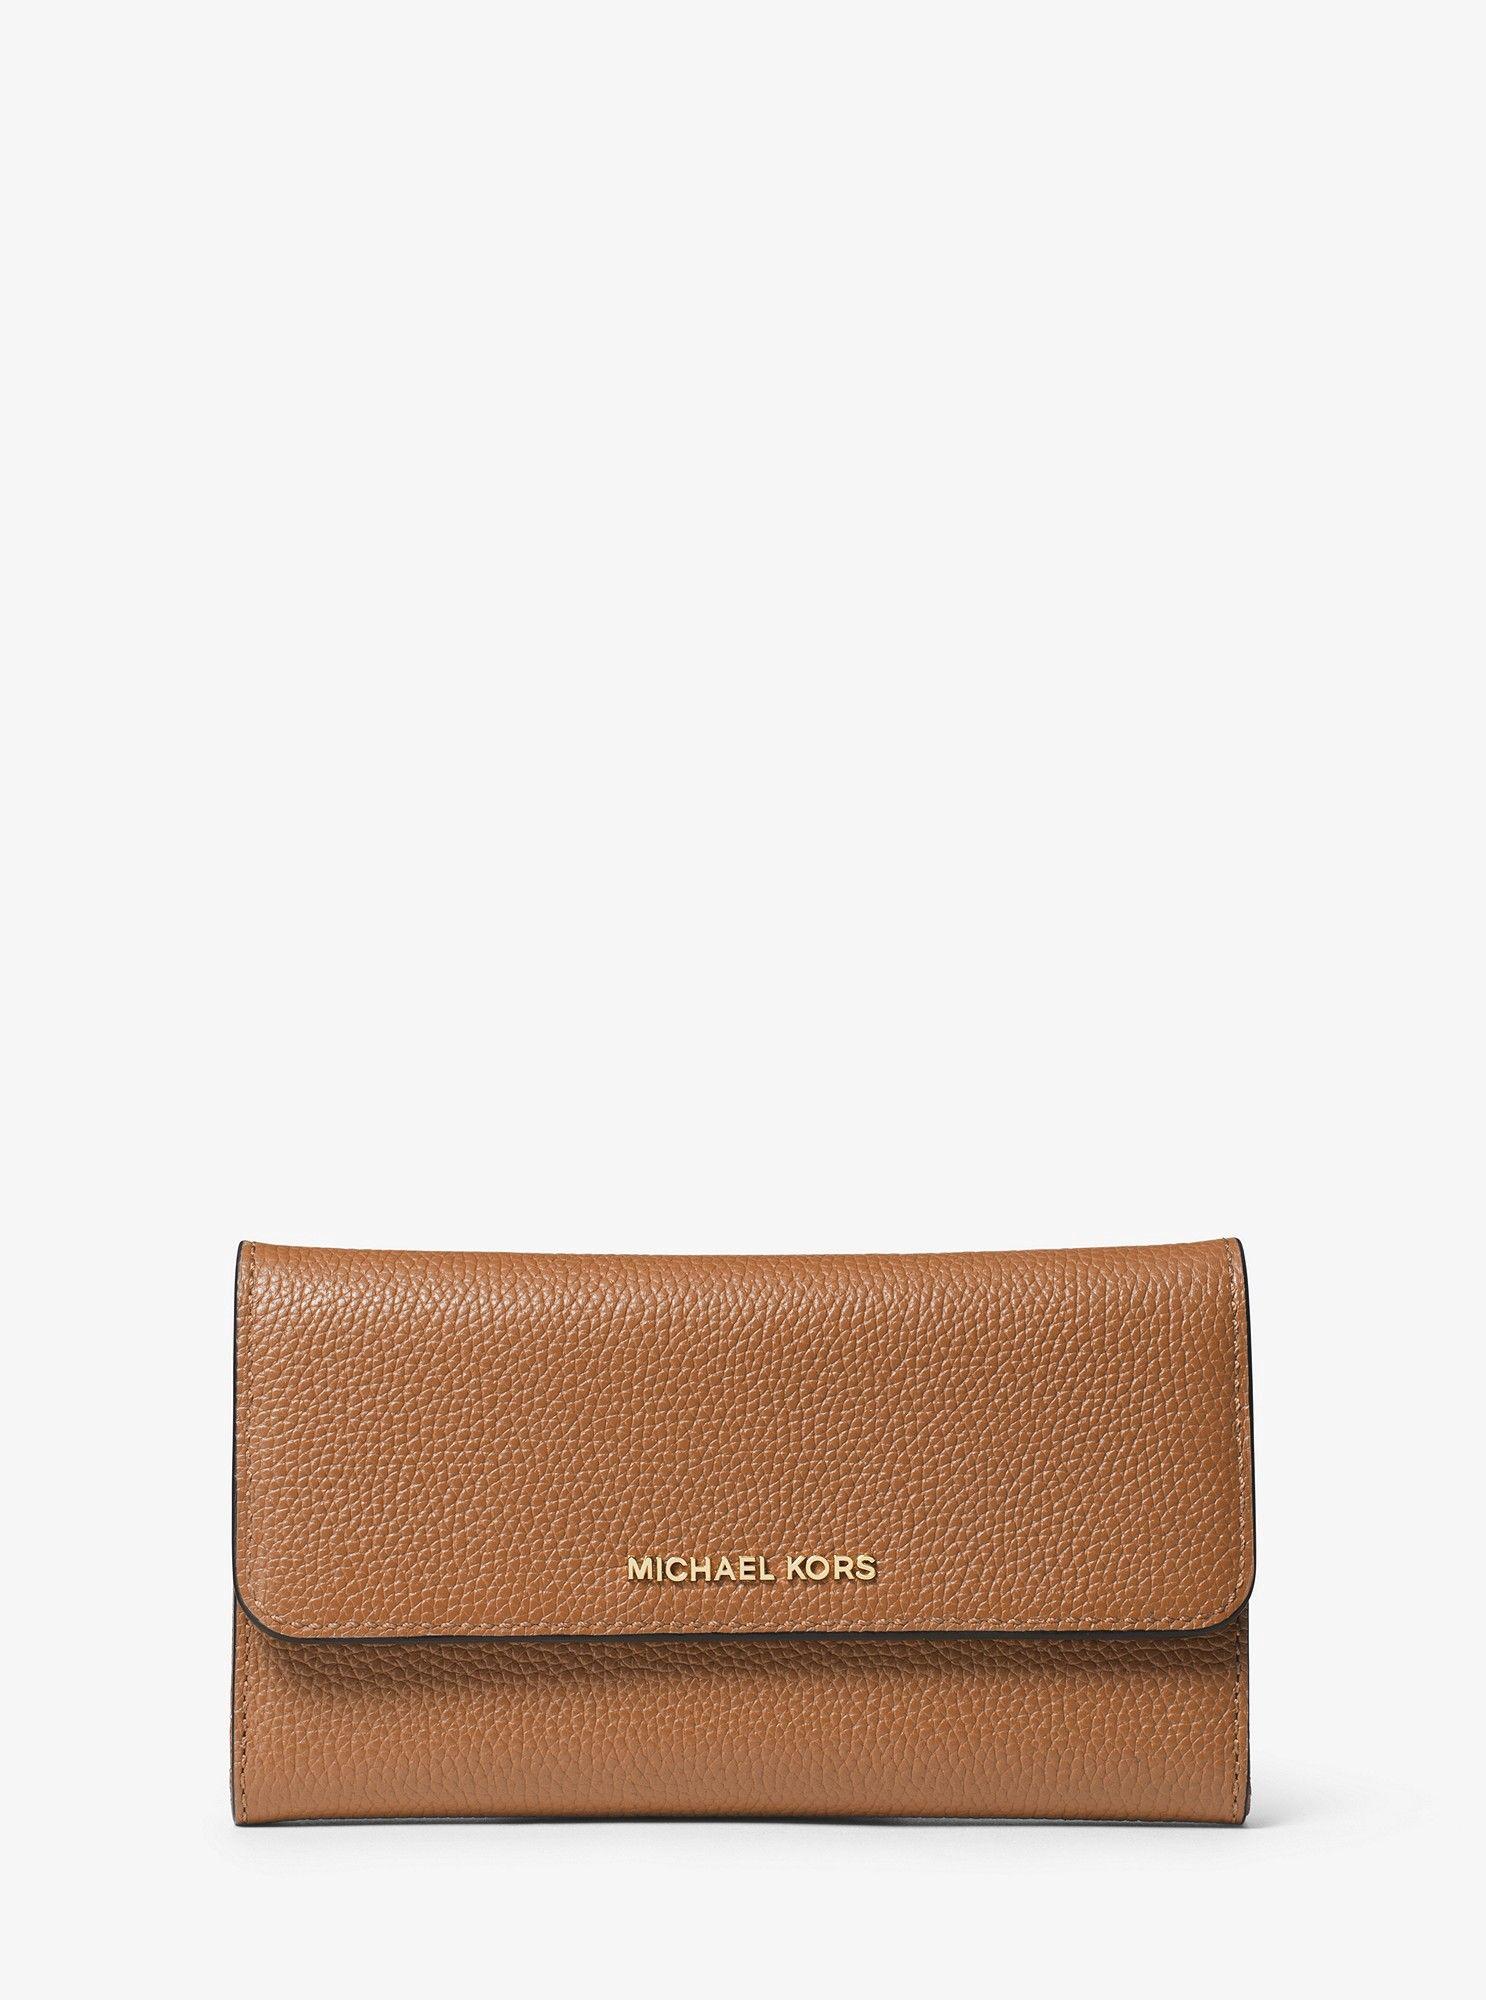 29fc647d39ec Michael Kors Mercer Tri-Fold Leather Wallet - Acorn | Products ...